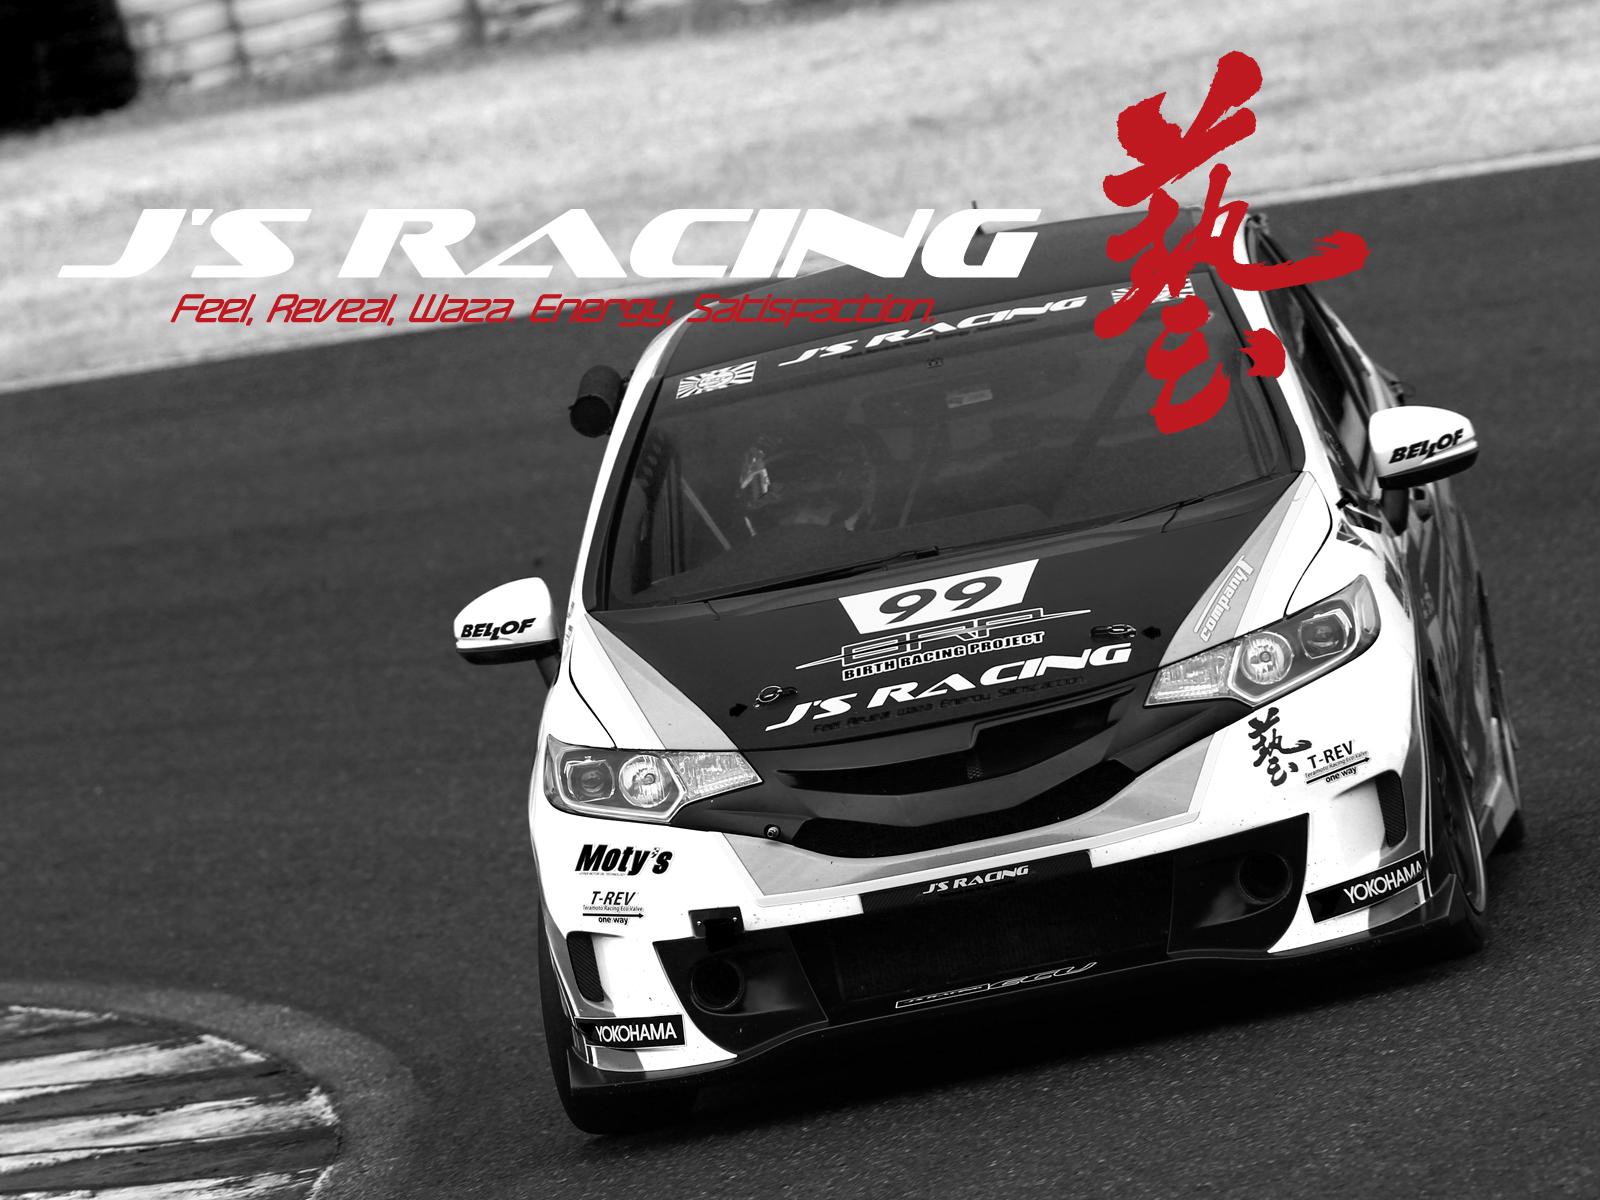 J'S RACING Photo